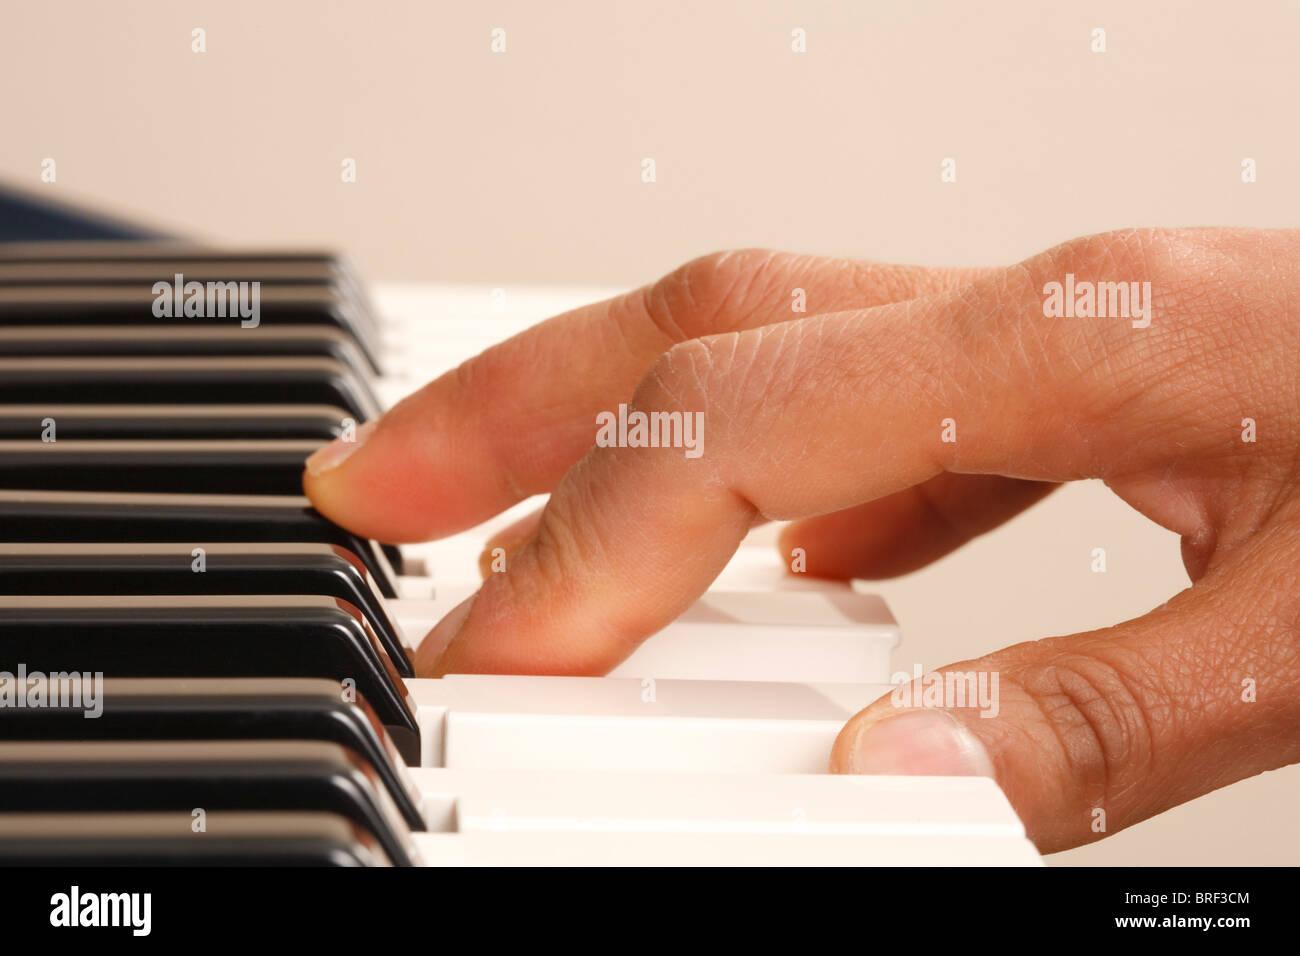 Closeup of a woman playing piano - Stock Image